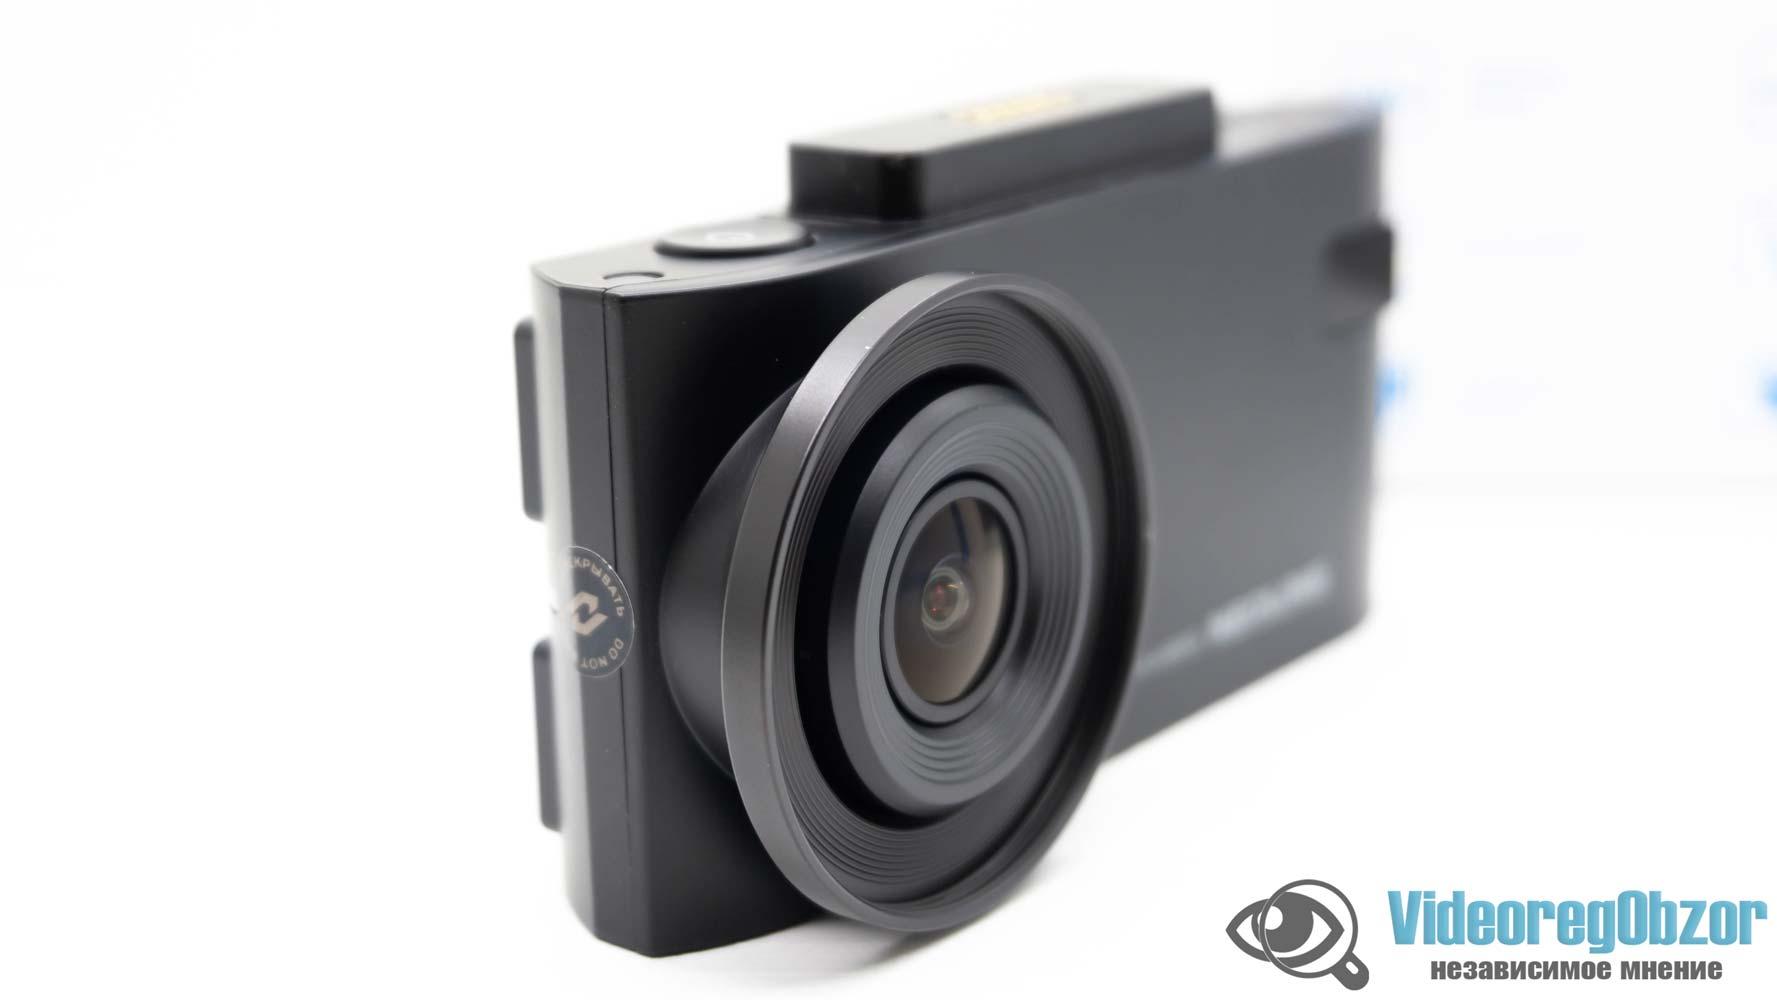 Neoline X COP 9200 обзор 17 VideoregObzor Neoline X-COP 9200: обзор видеорегистратора с радар-детектором